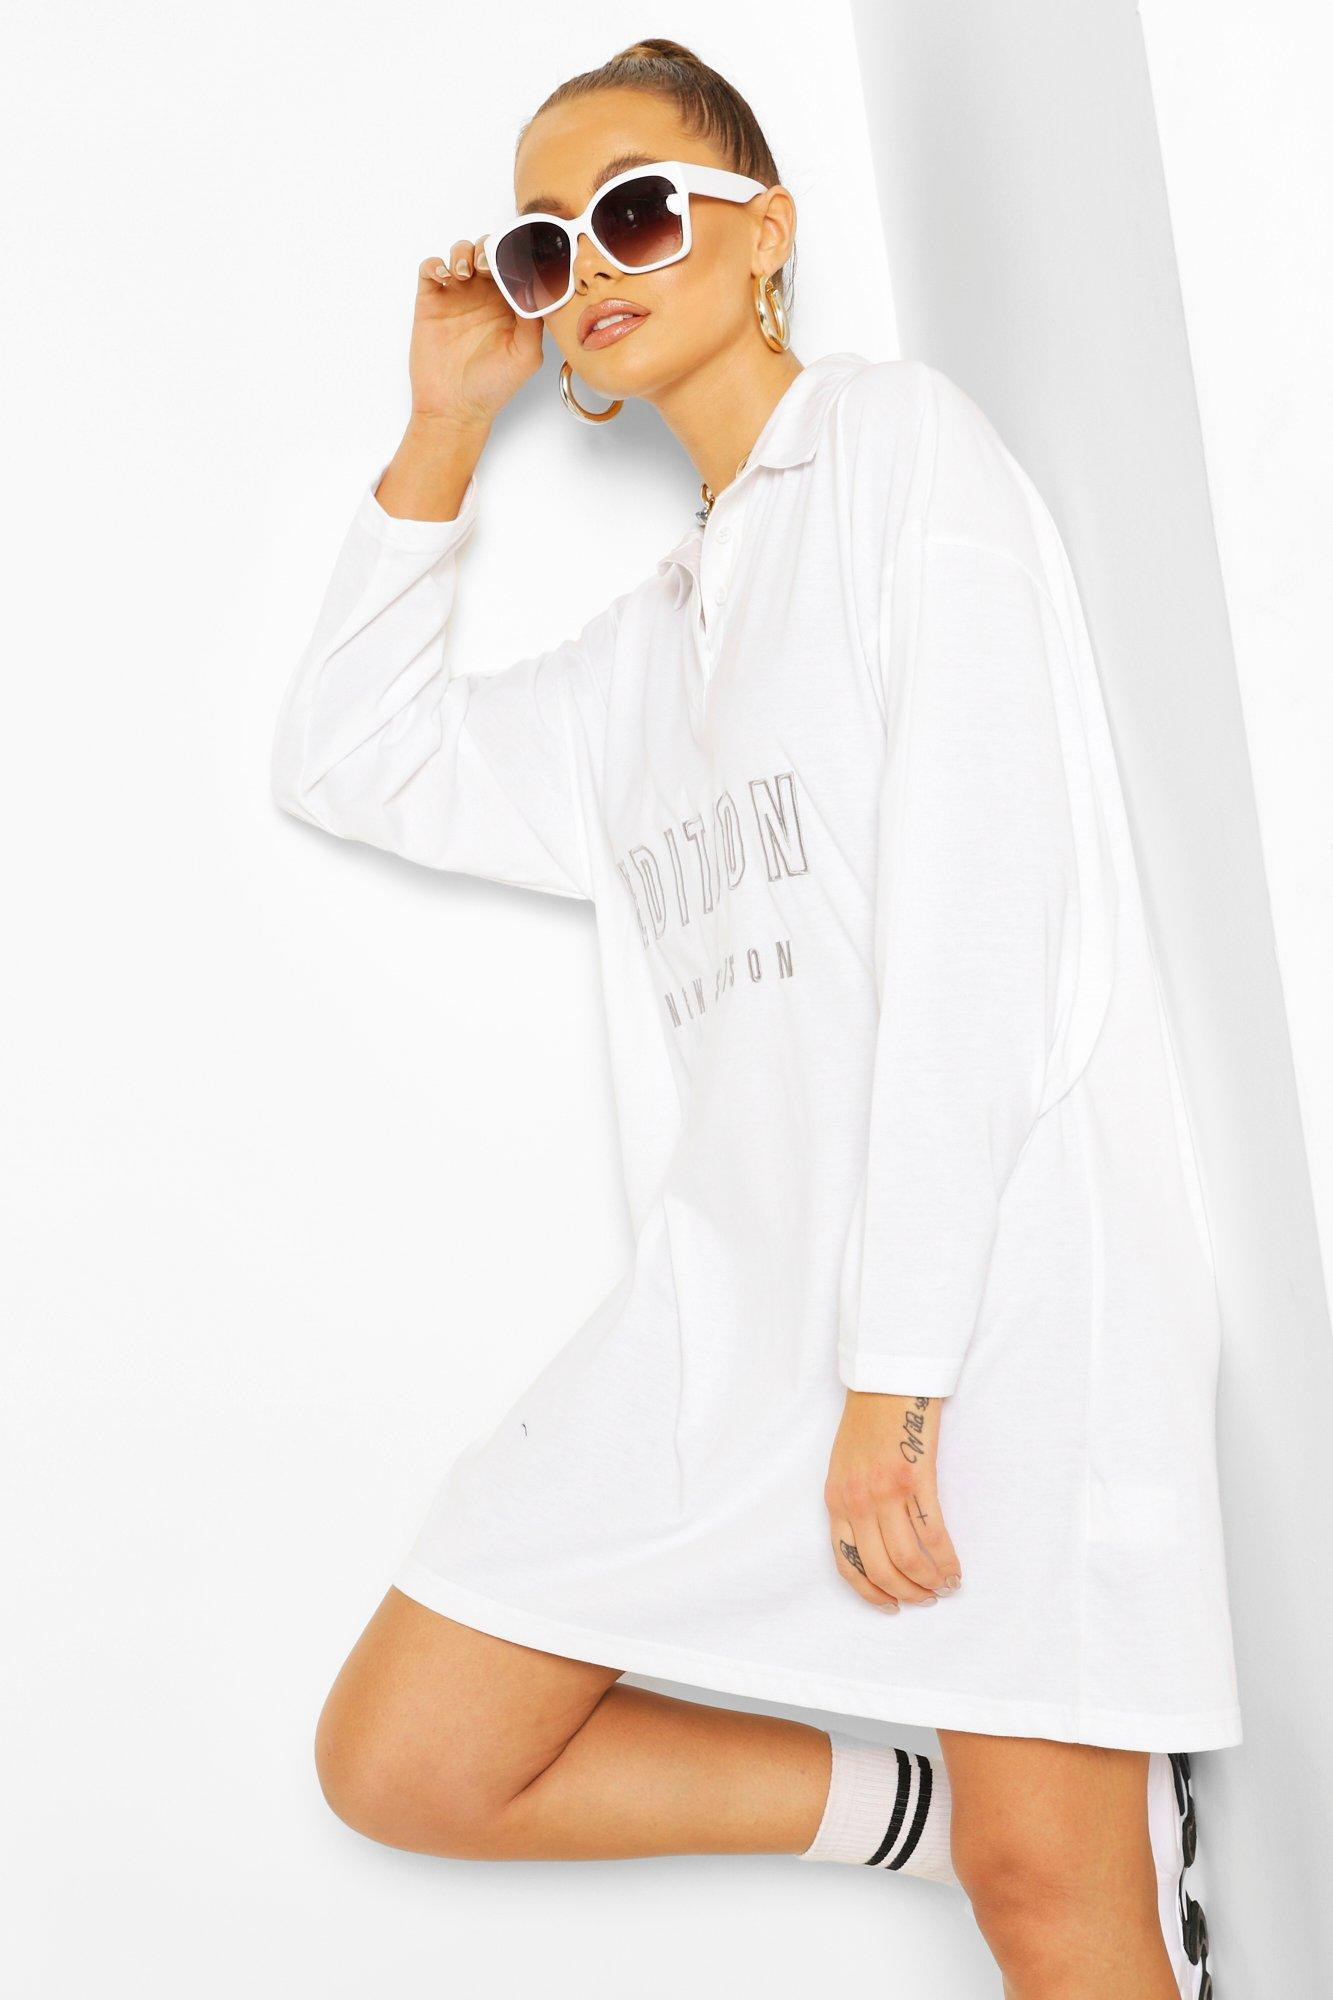 boohoo Womens Embroidered Collar Polo T-Shirt Dress - White - 8, White